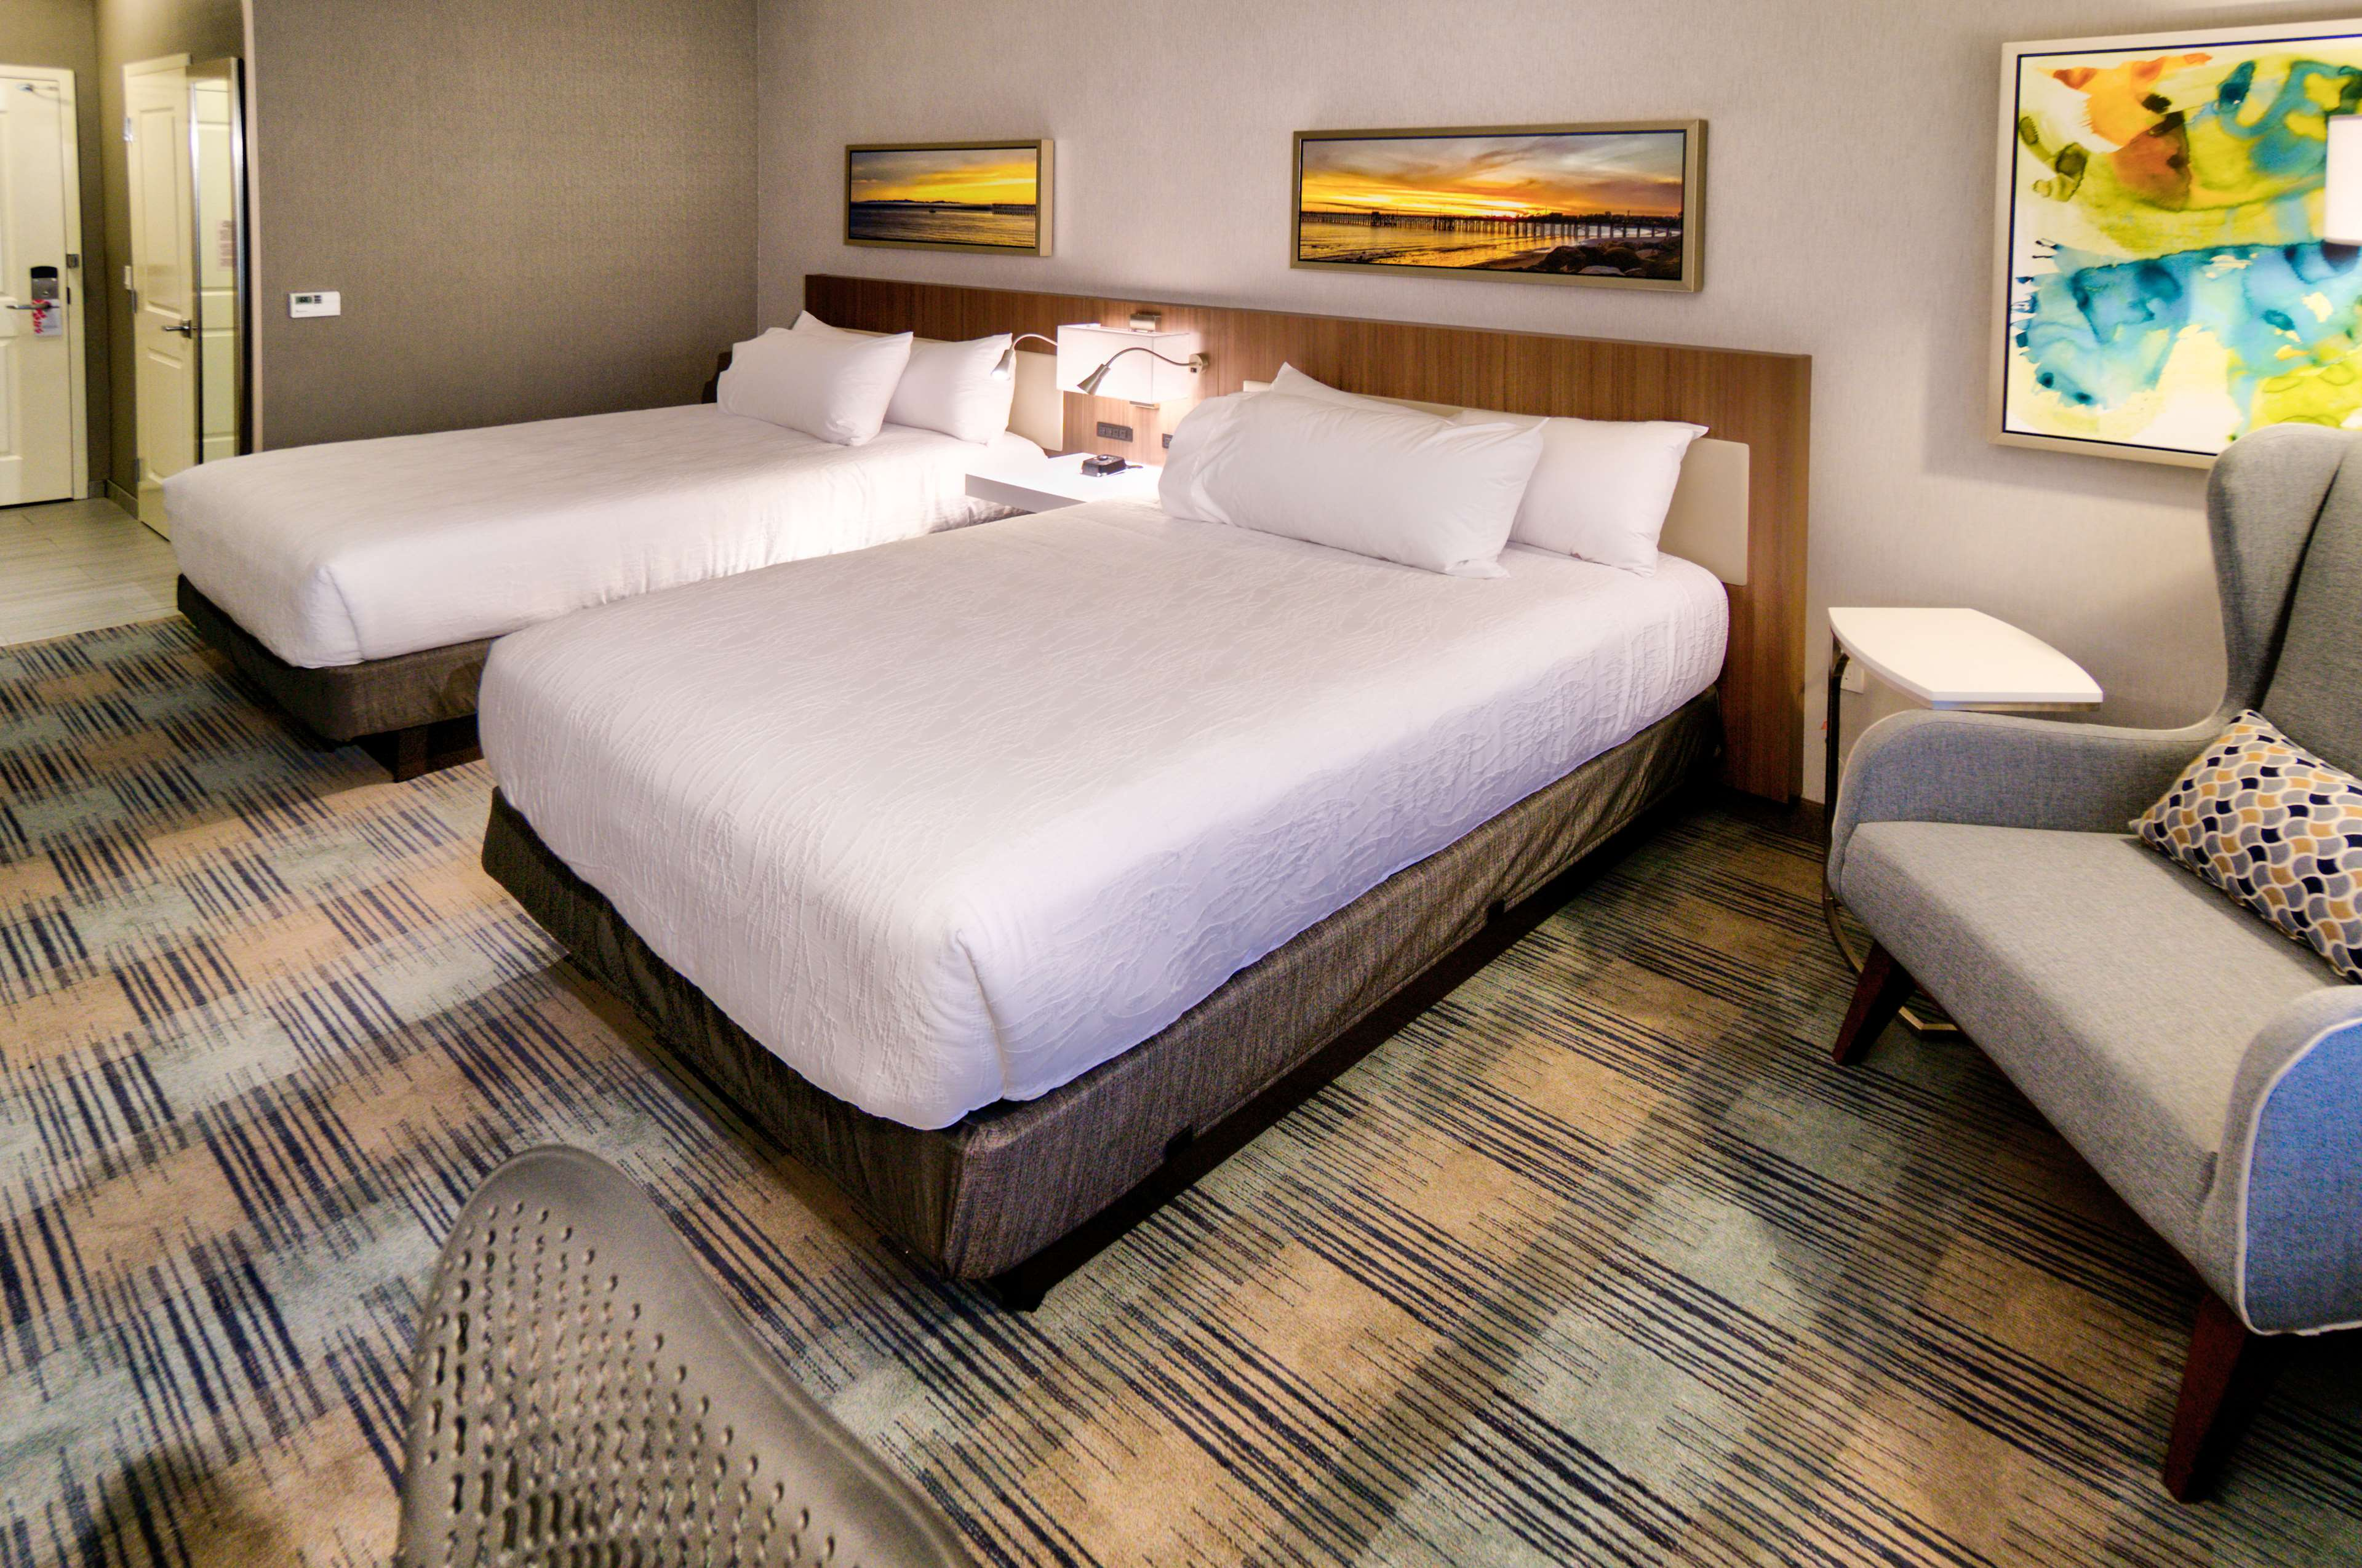 Hilton Garden Inn Santa Barbara/Goleta image 34